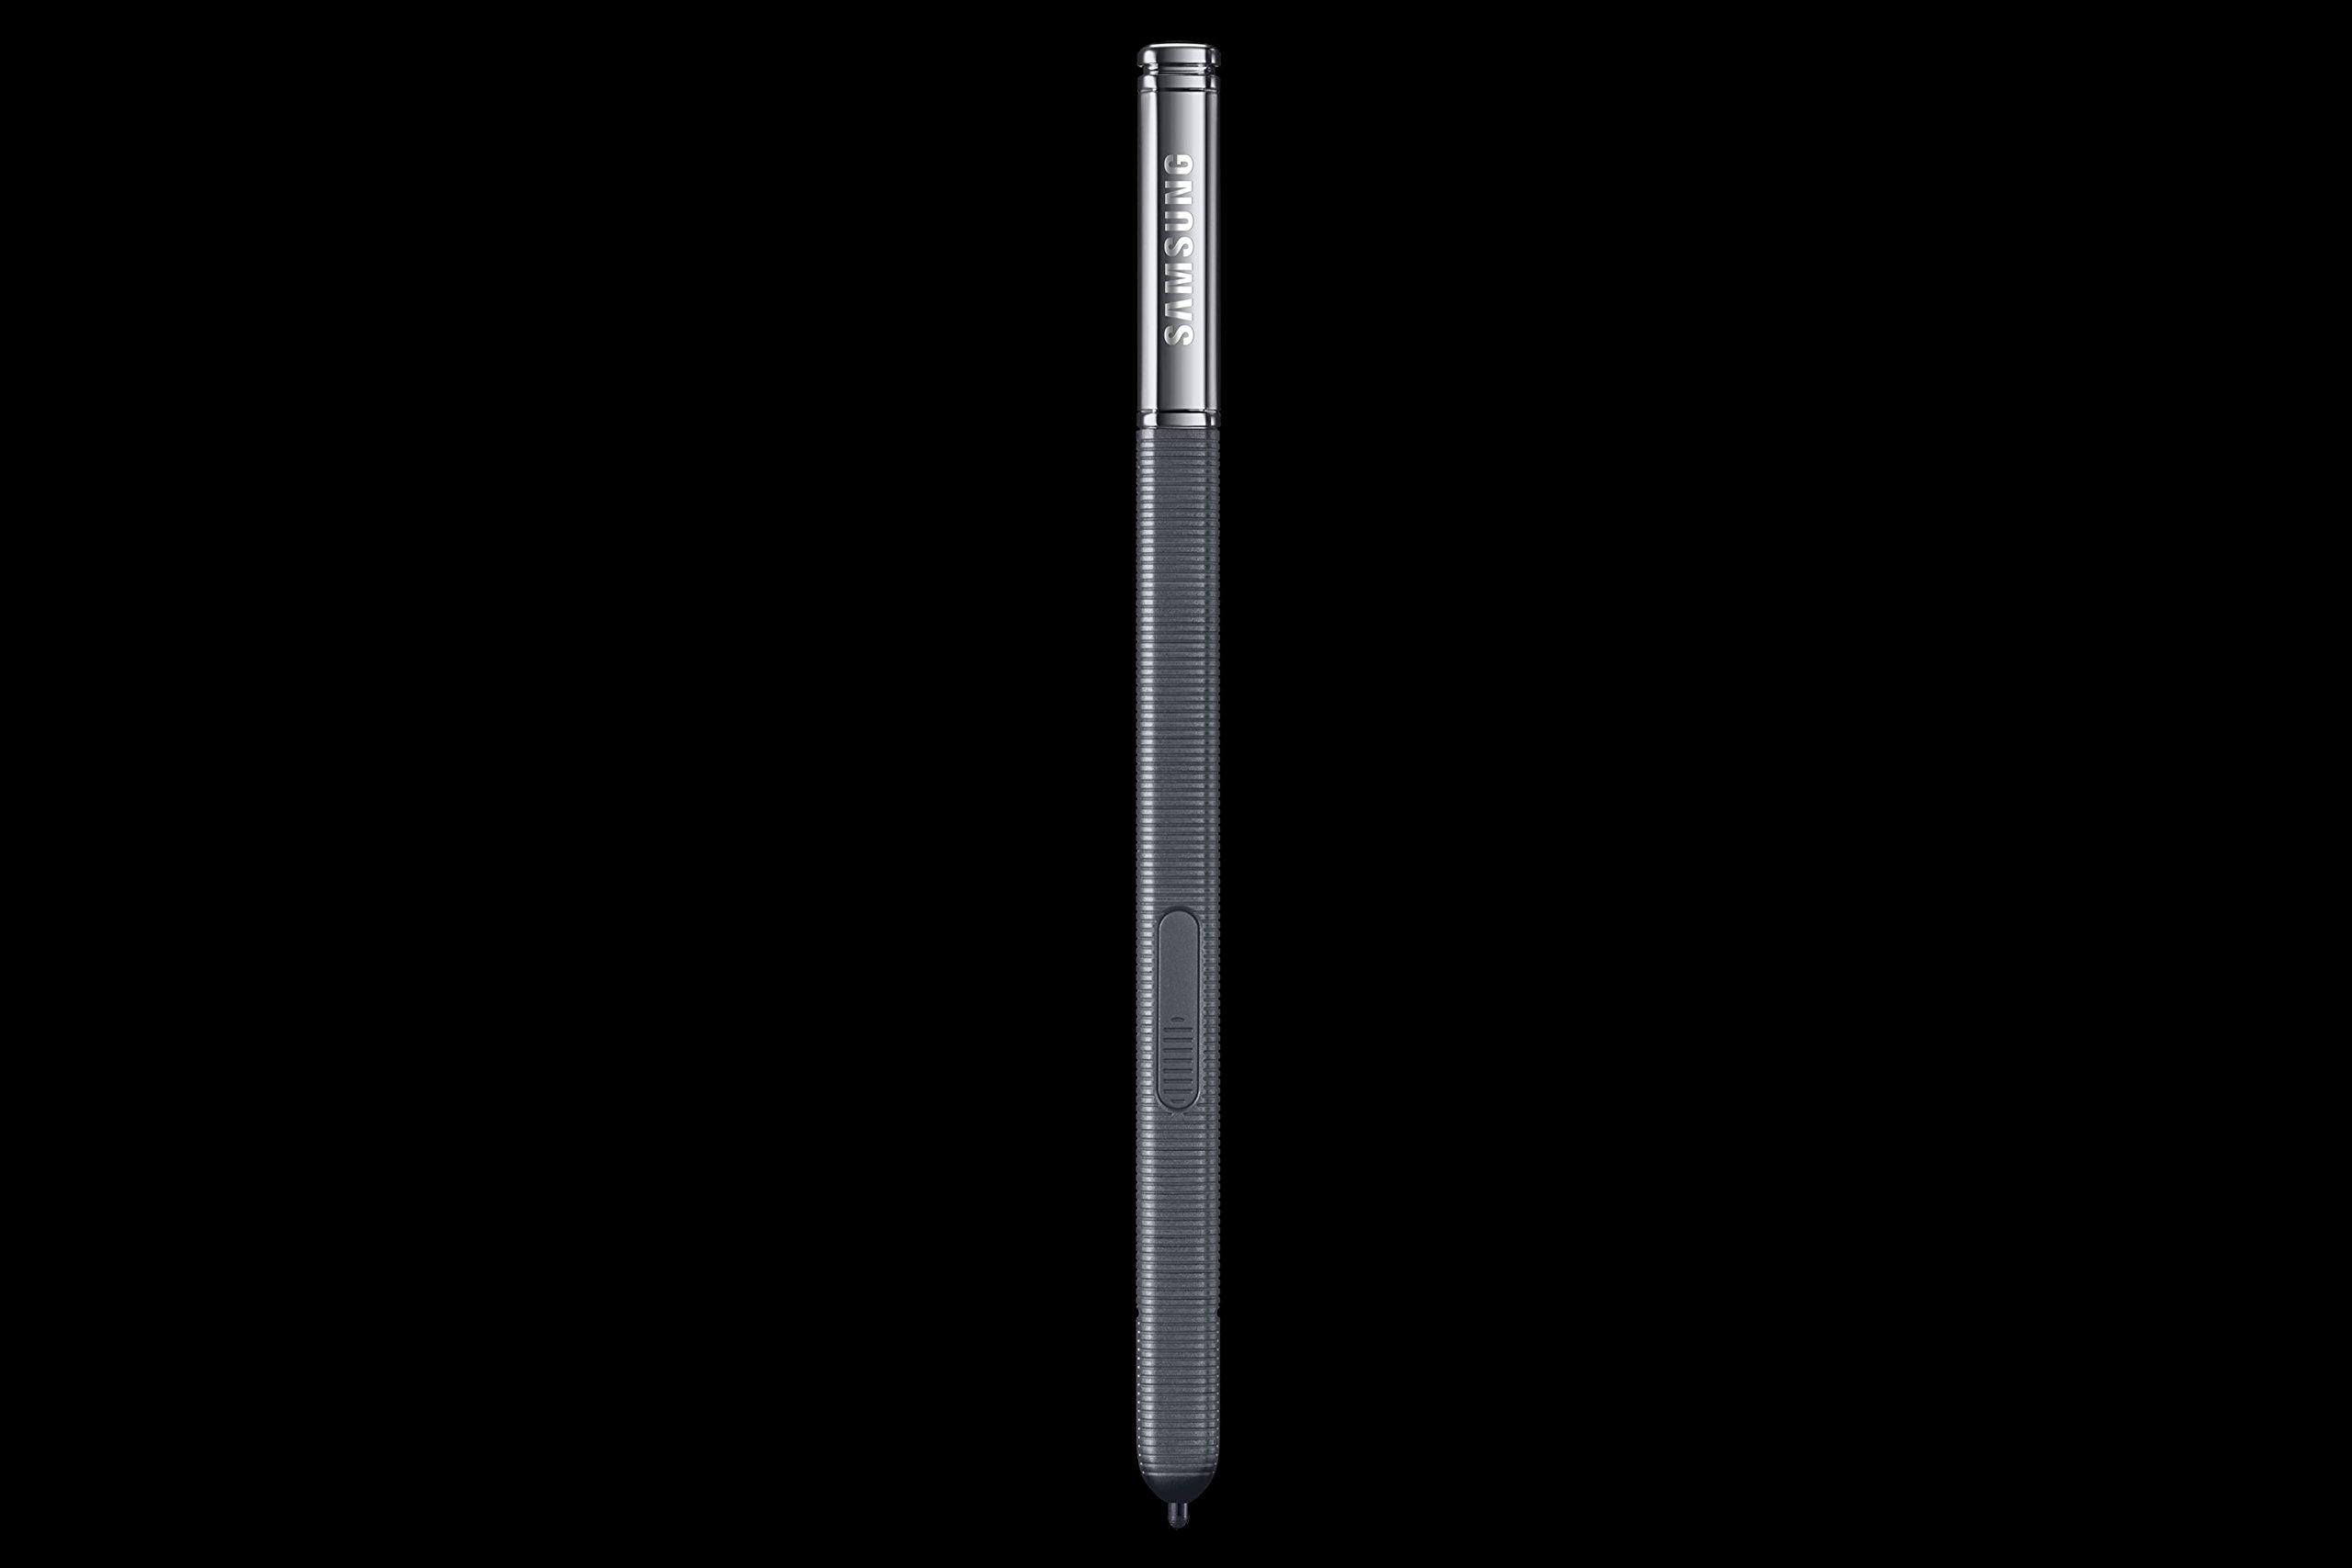 Samsung Galaxy Note 4 Stylus S Pen -Black